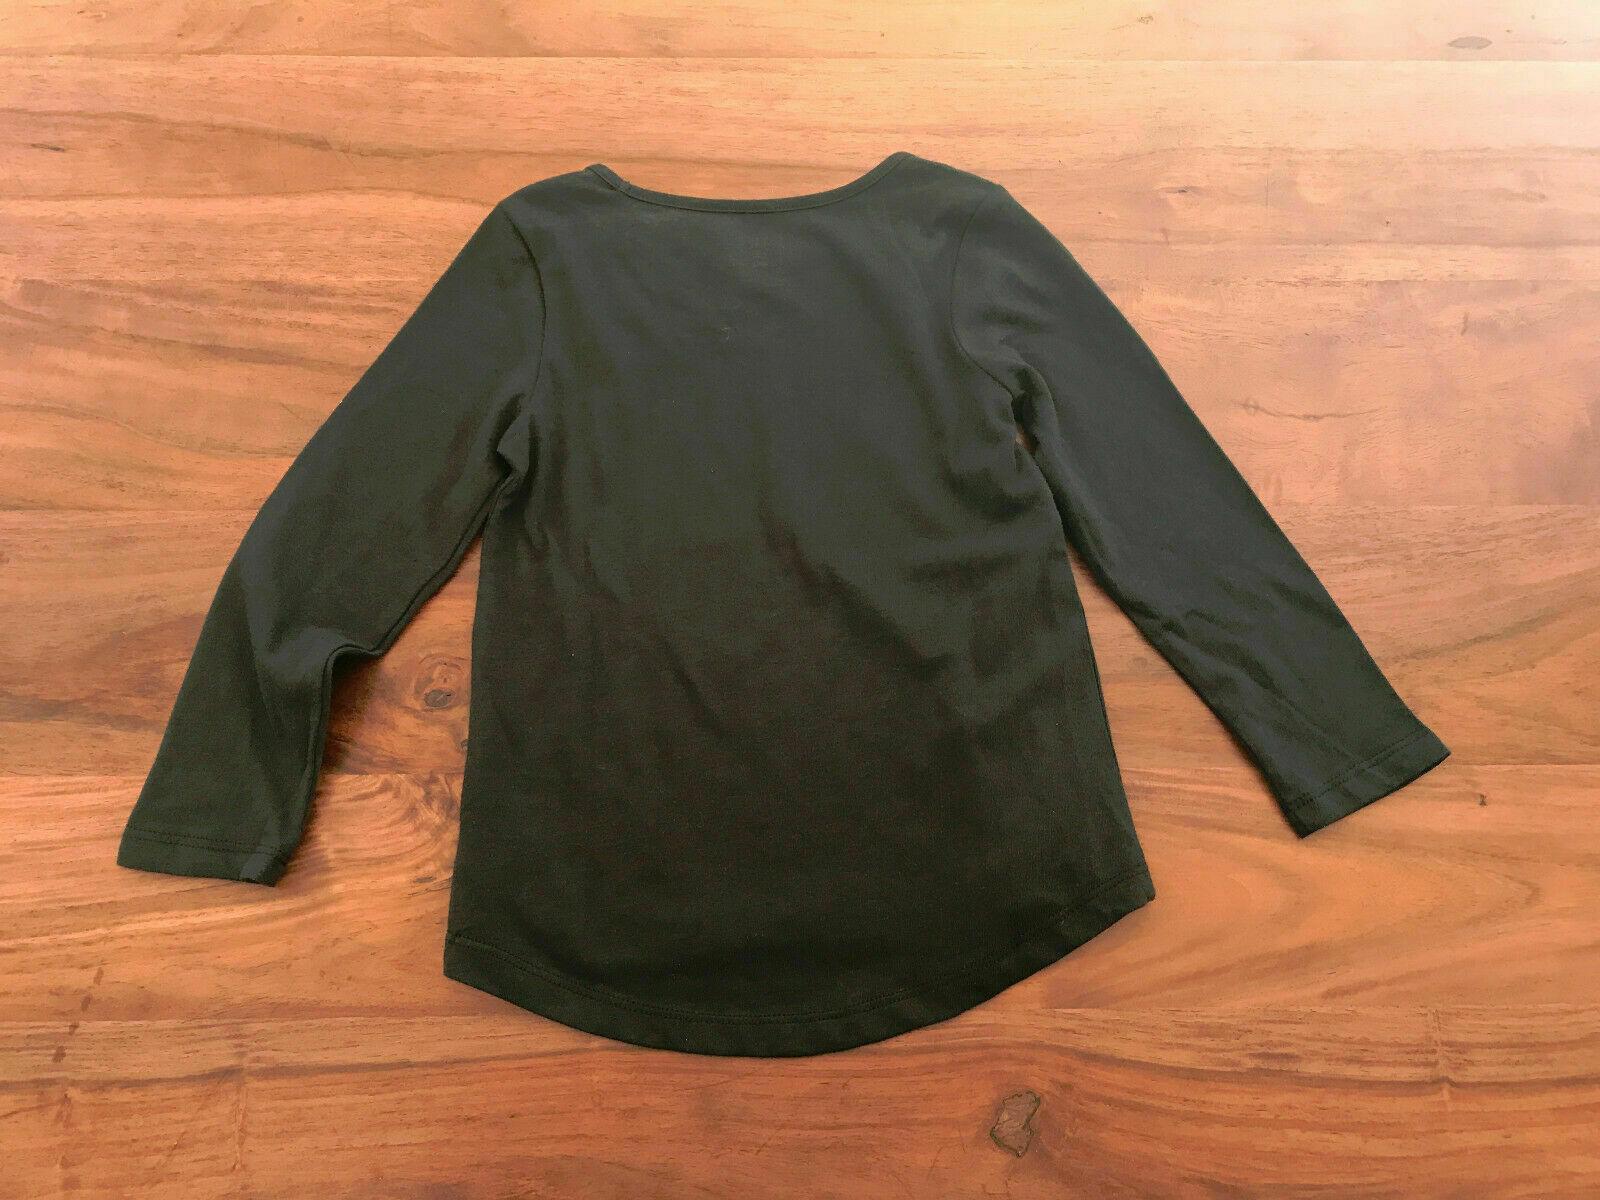 Gap Kids Girls T-shirt 4 4T Cream Gray Black Graphic Snow Winter Long Sleeve New image 2